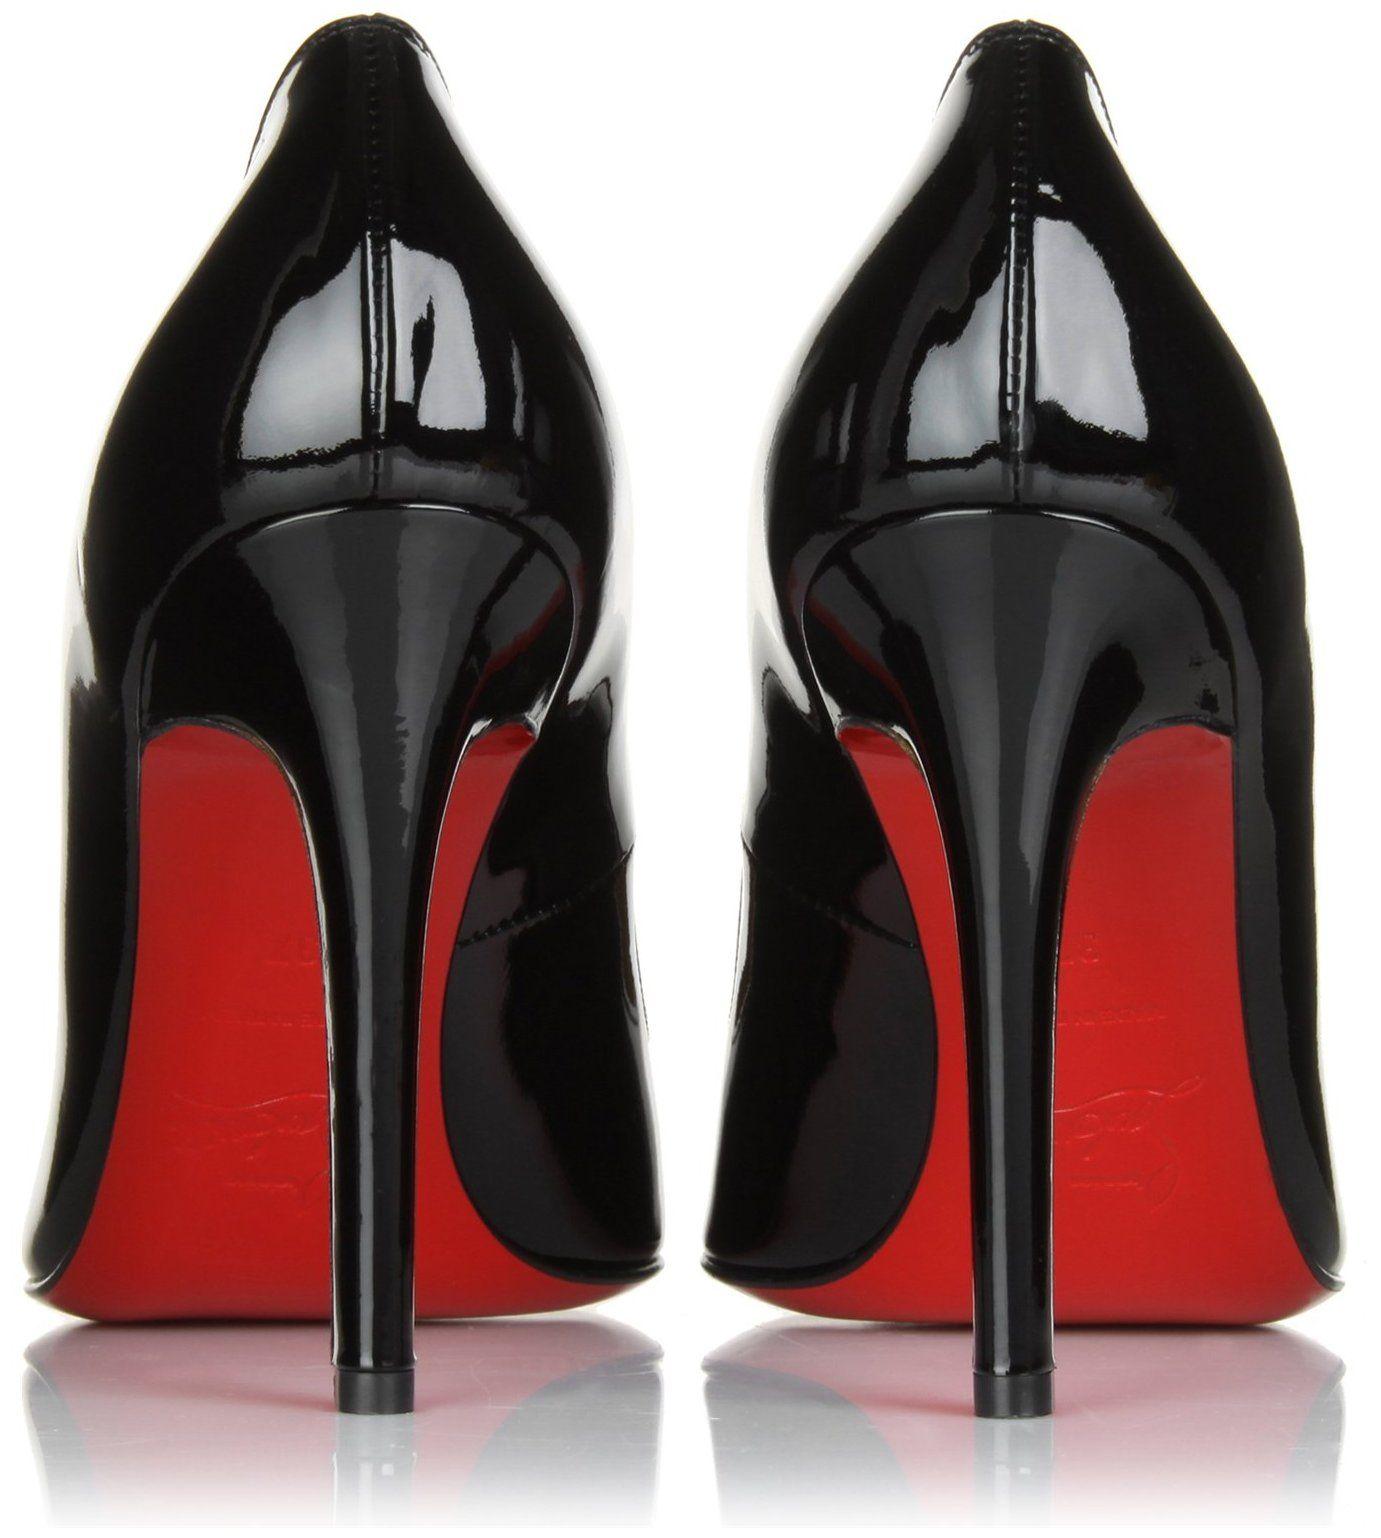 1d82d86b4a0ee The  True Lady has a pair of these. Christian Louboutin Designer Shoes